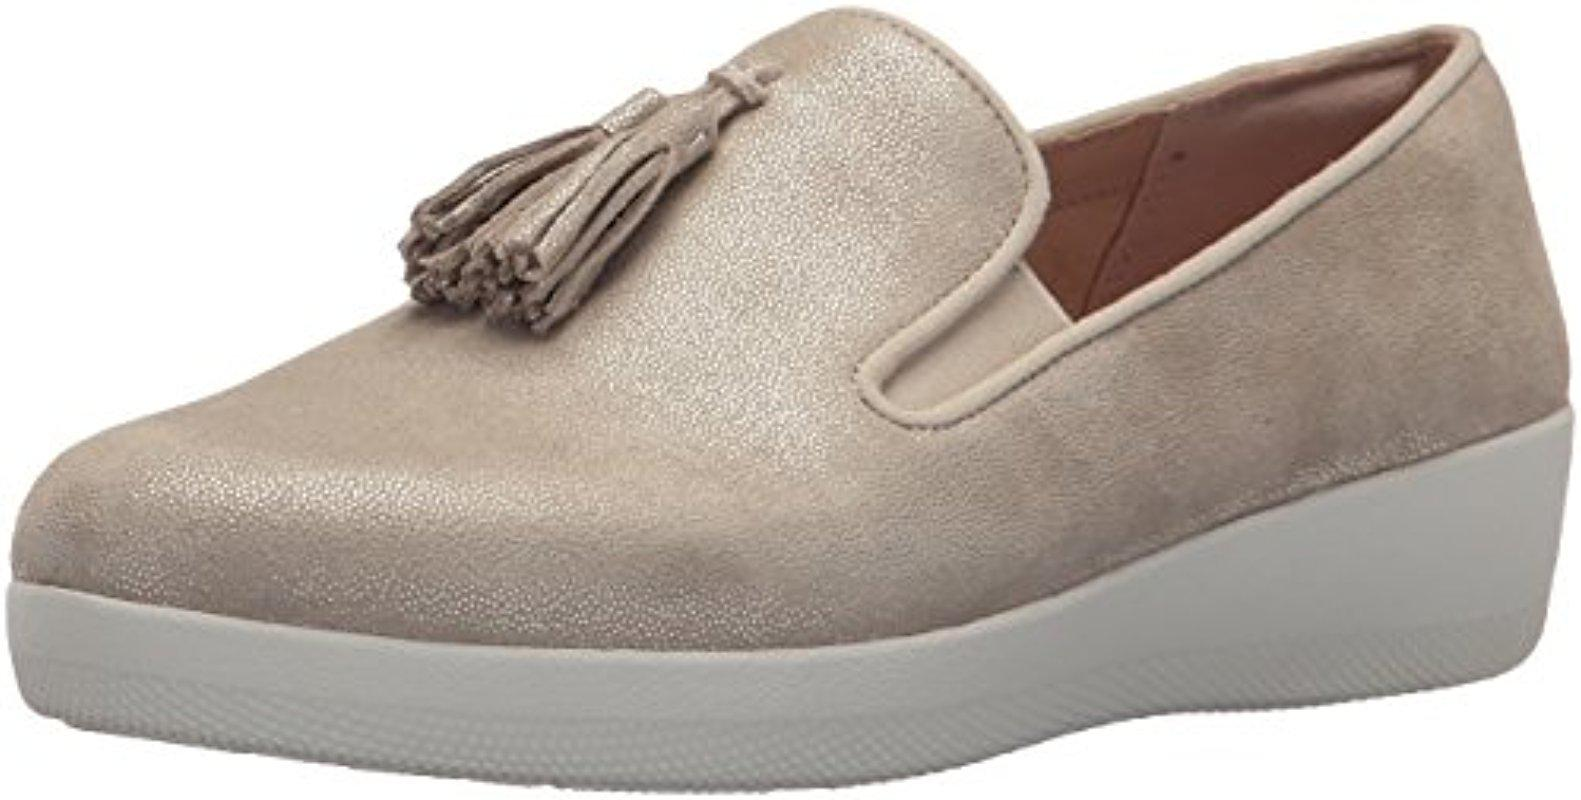 a17fb2477a11aa Fitflop. Women s Tassel Superskate Shimmer Loafer